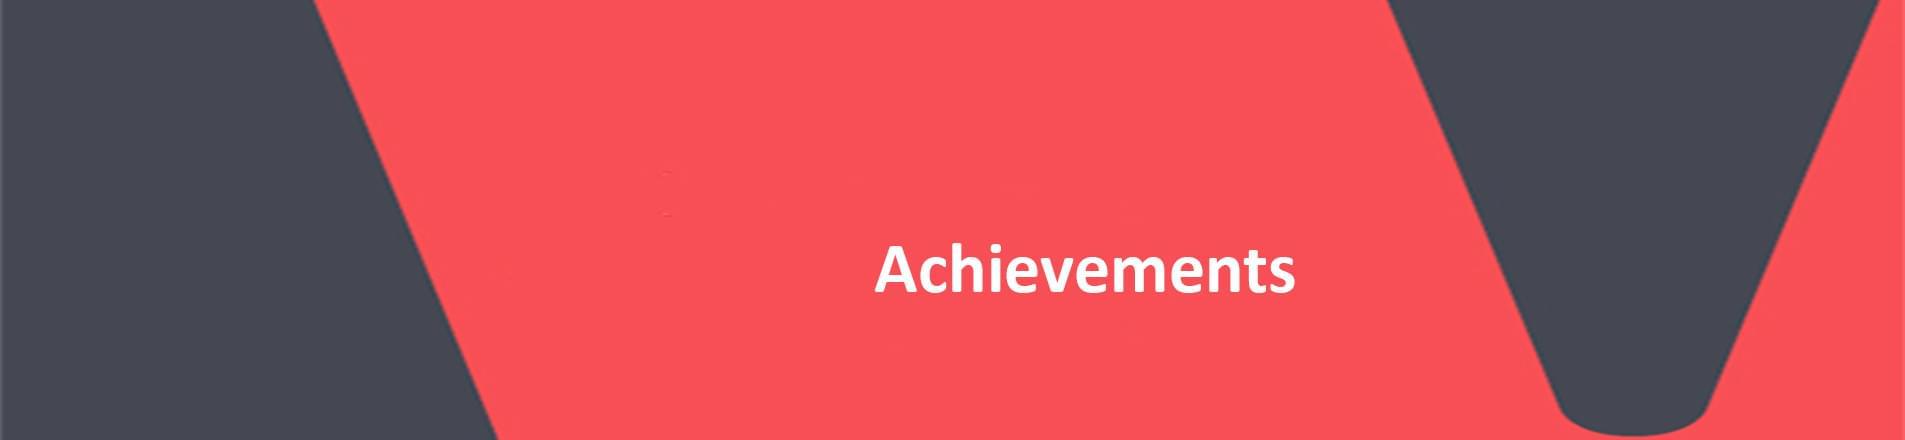 'Achievements' on red VERCIDA background